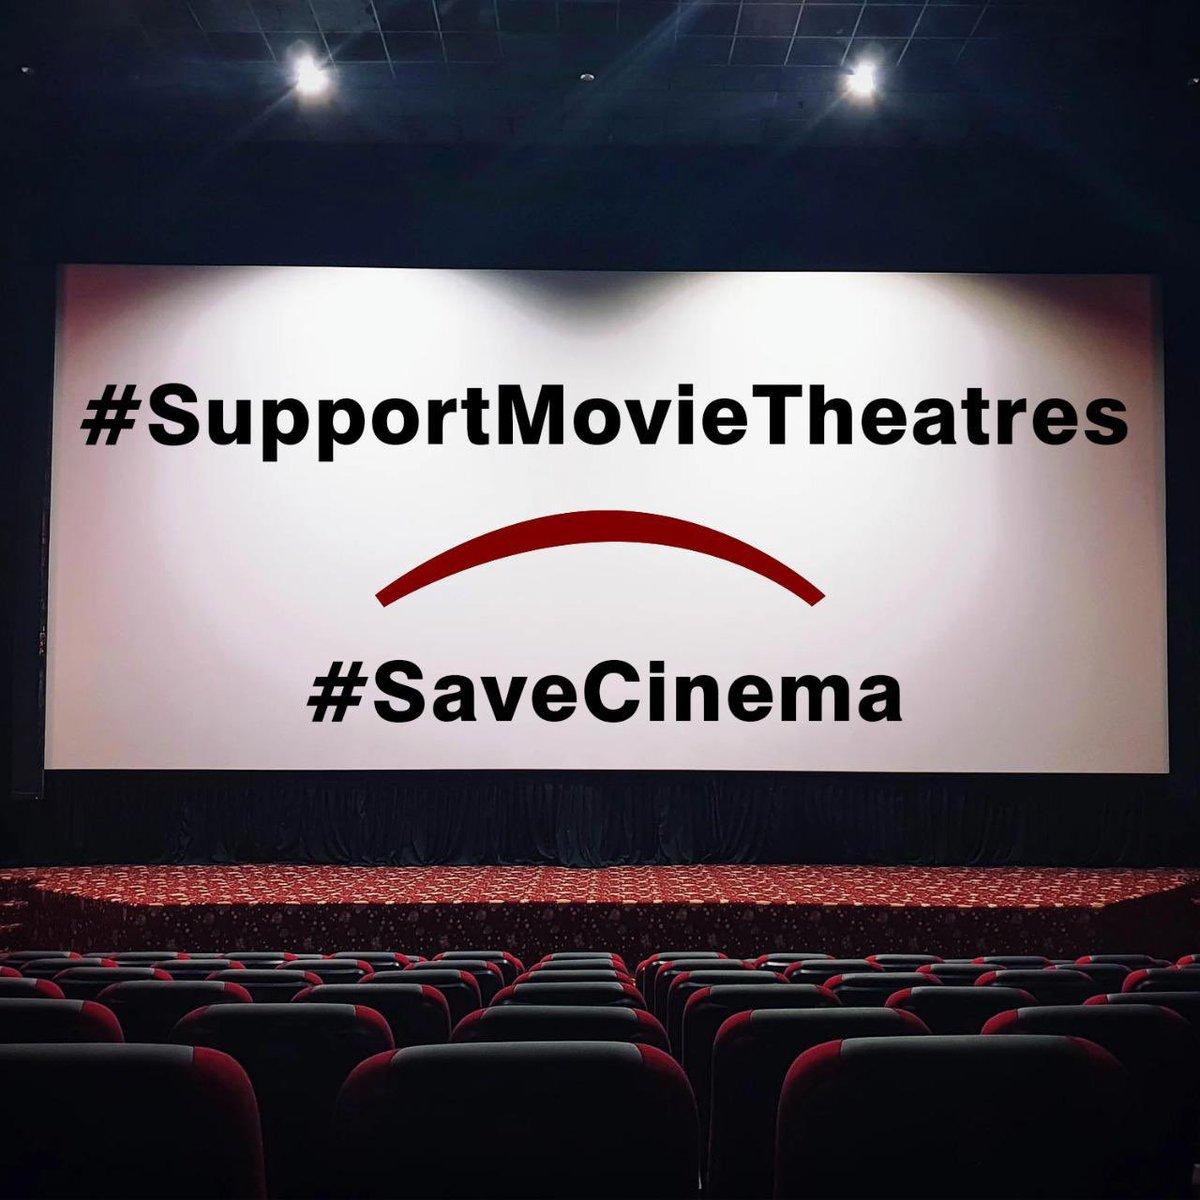 #SupportMovieTheaters https://t.co/414ki0HDcf